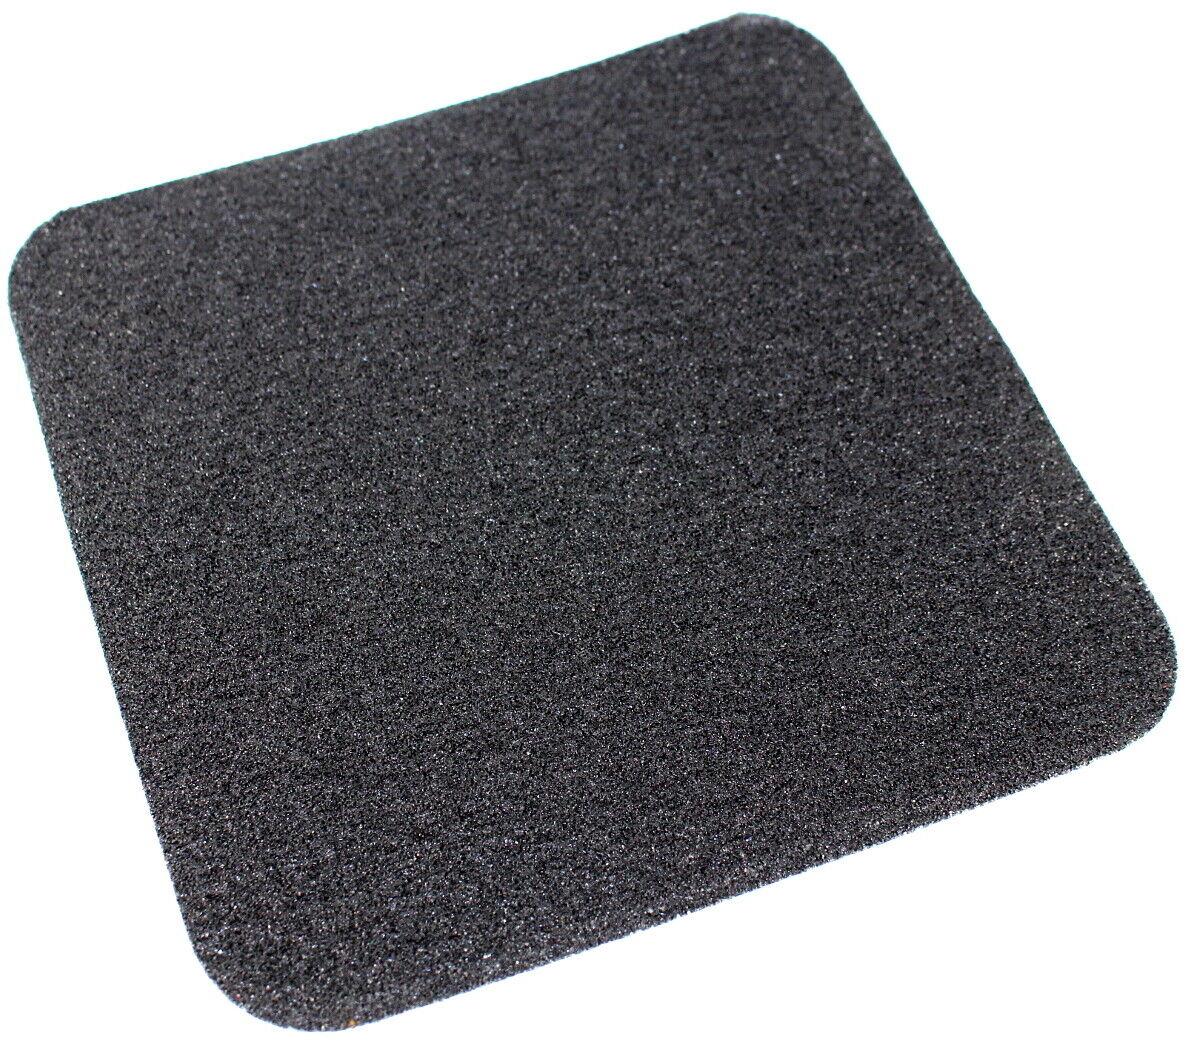 10 Pk ANTI SLIP 140x140mm Self Adhesive FLOOR TILES Squares BLACK Standard Grade